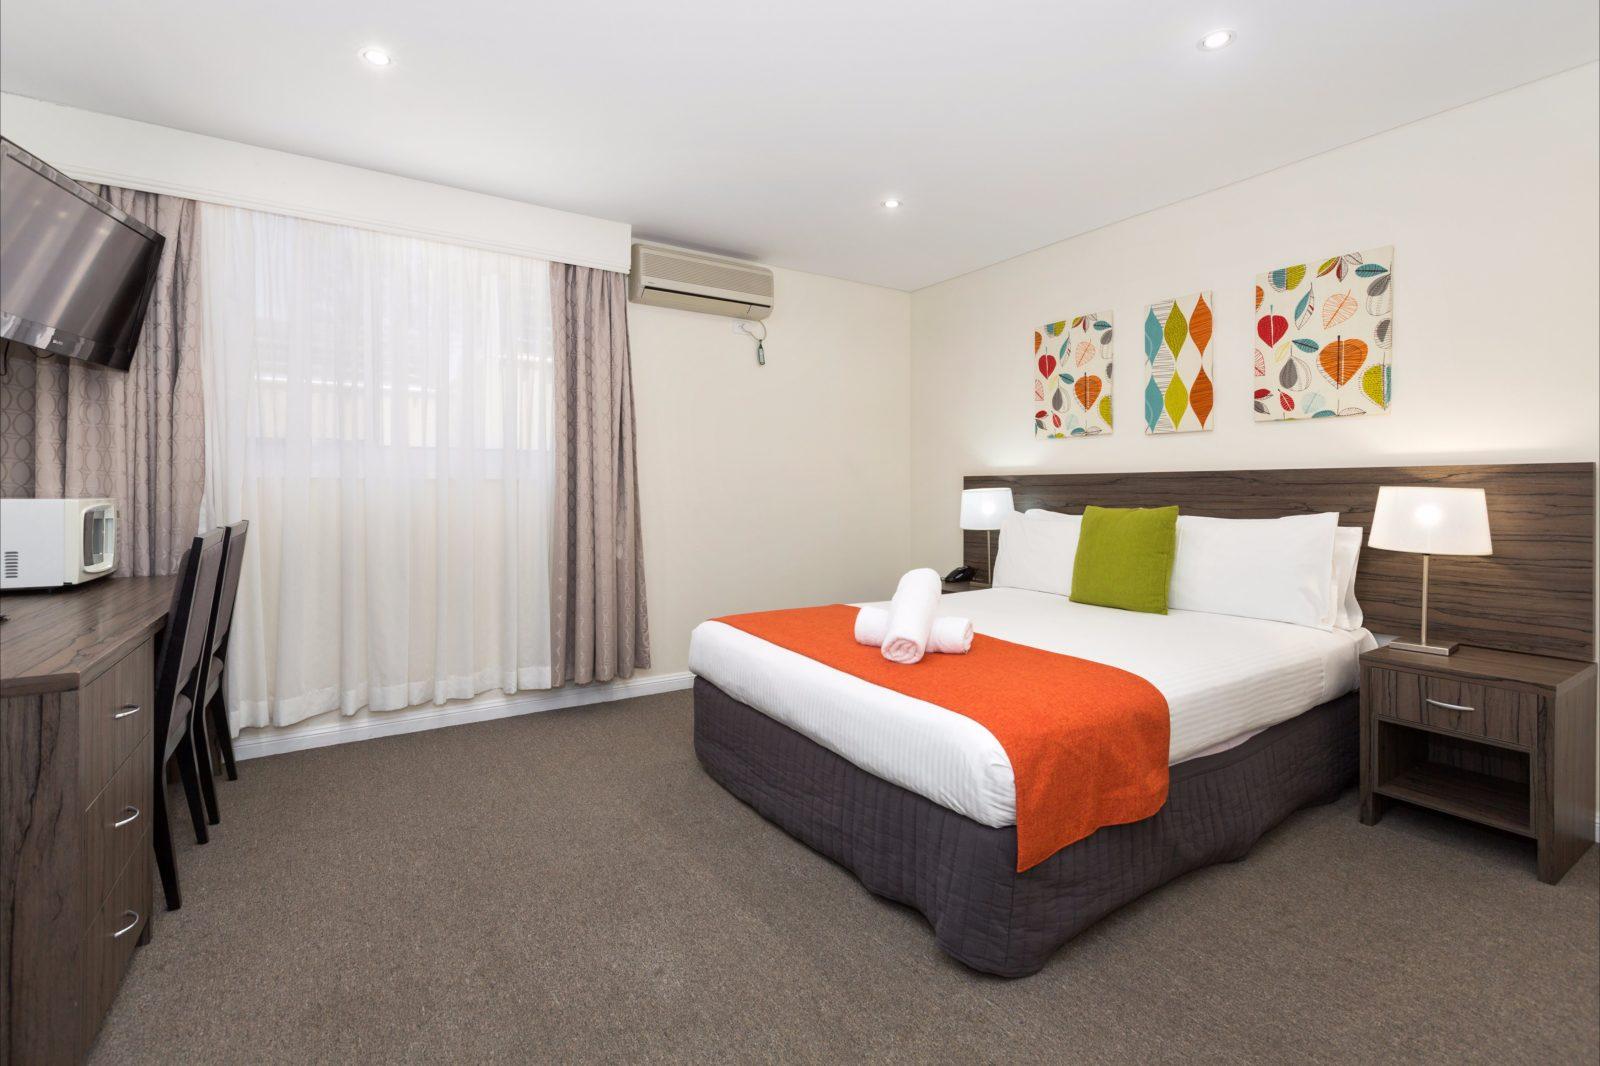 Renovated King room at Comfort Inn Aden Mudgee